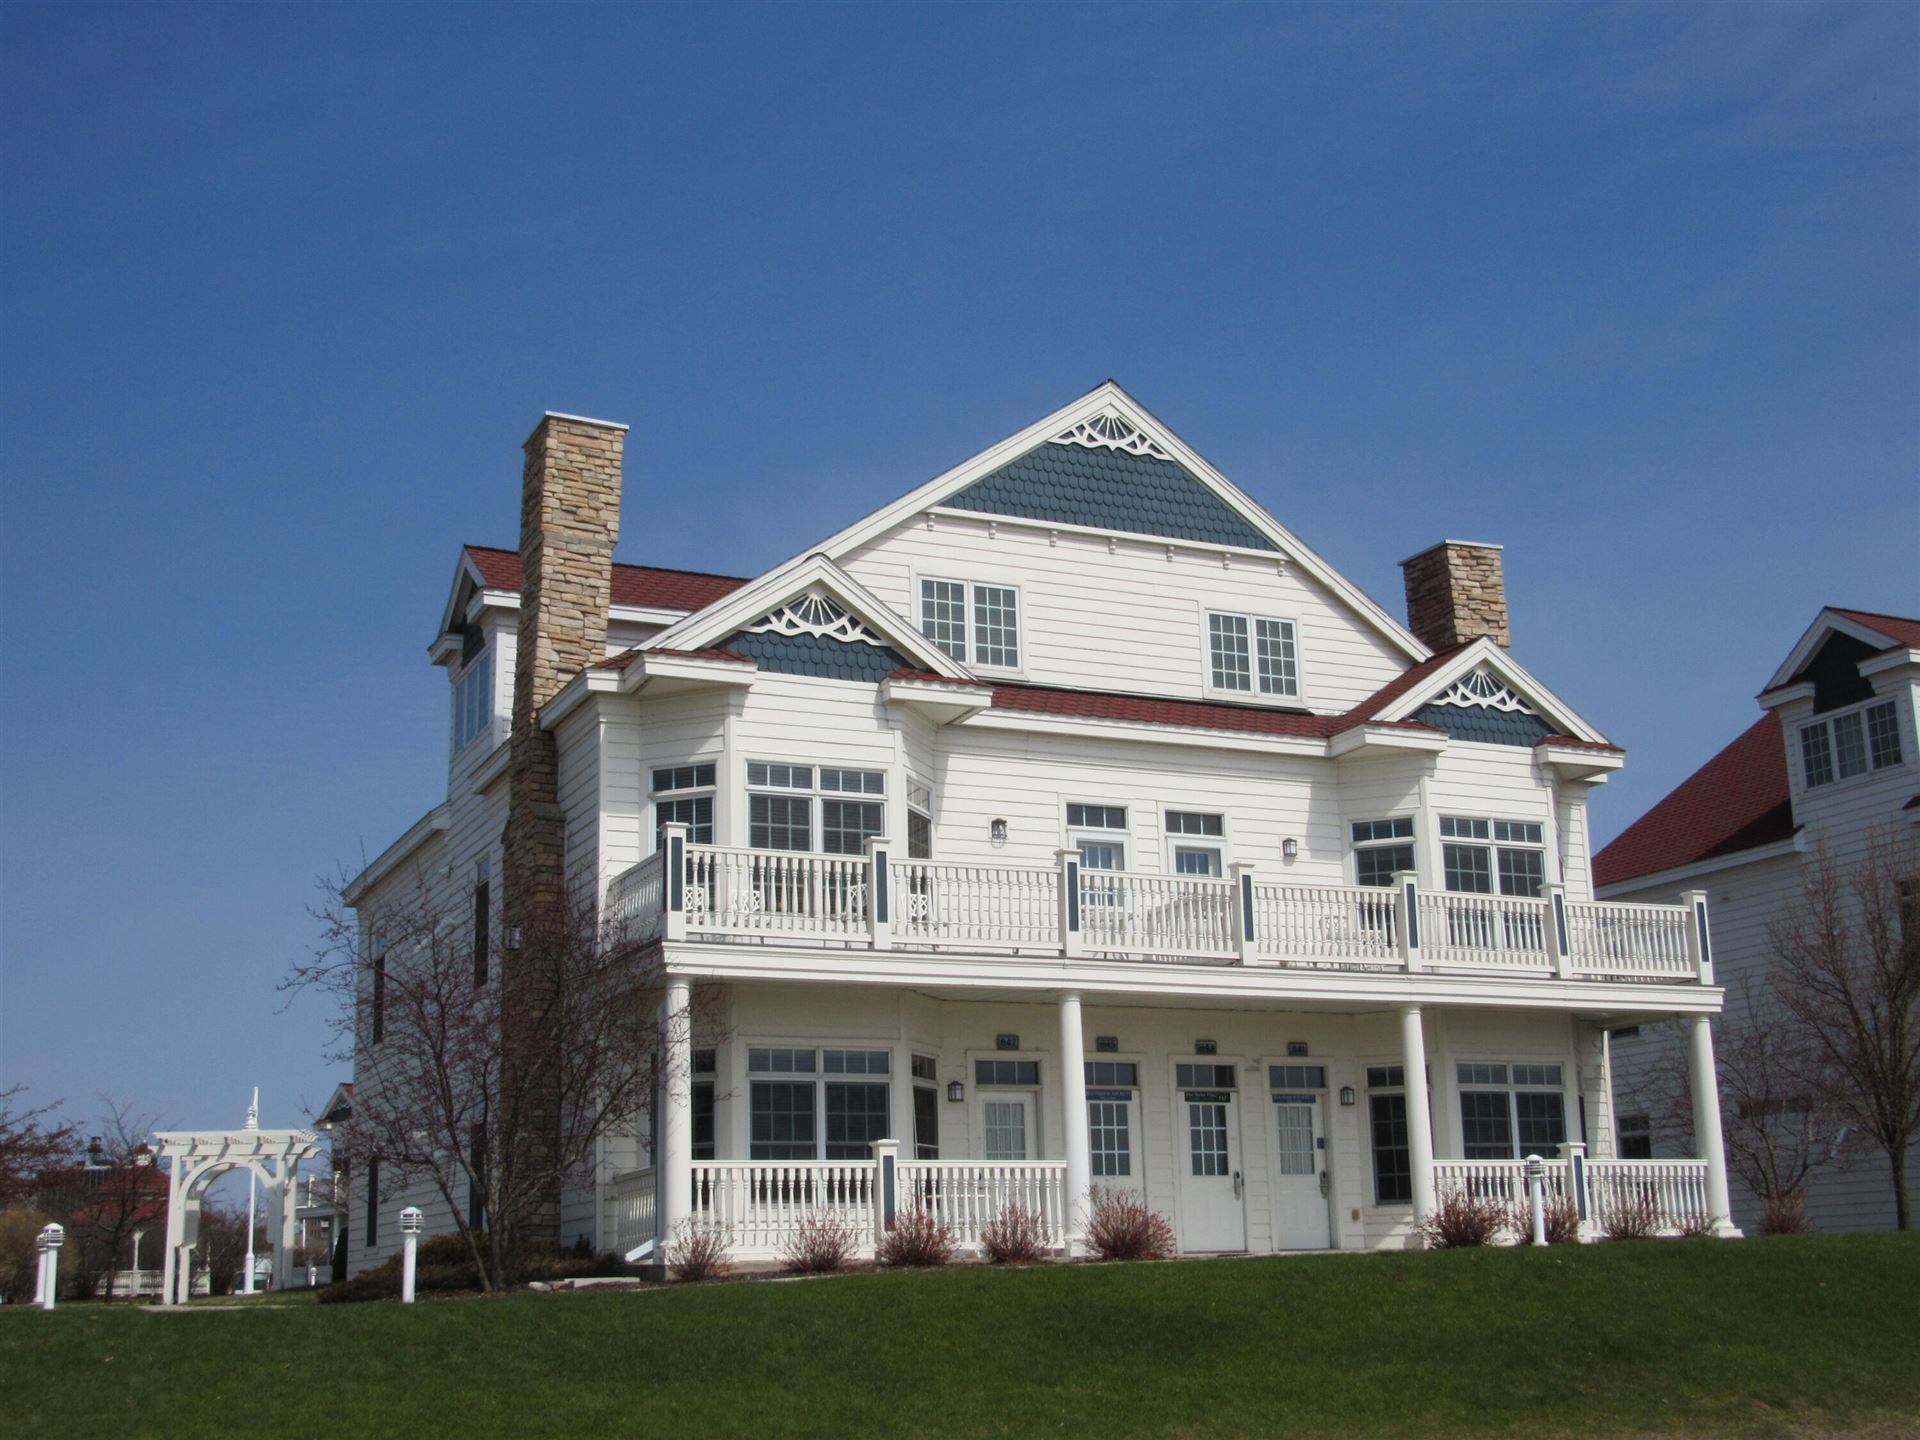 827 Beachfront Dr, Sheboygan, WI 53081 - MLS#: 1742148